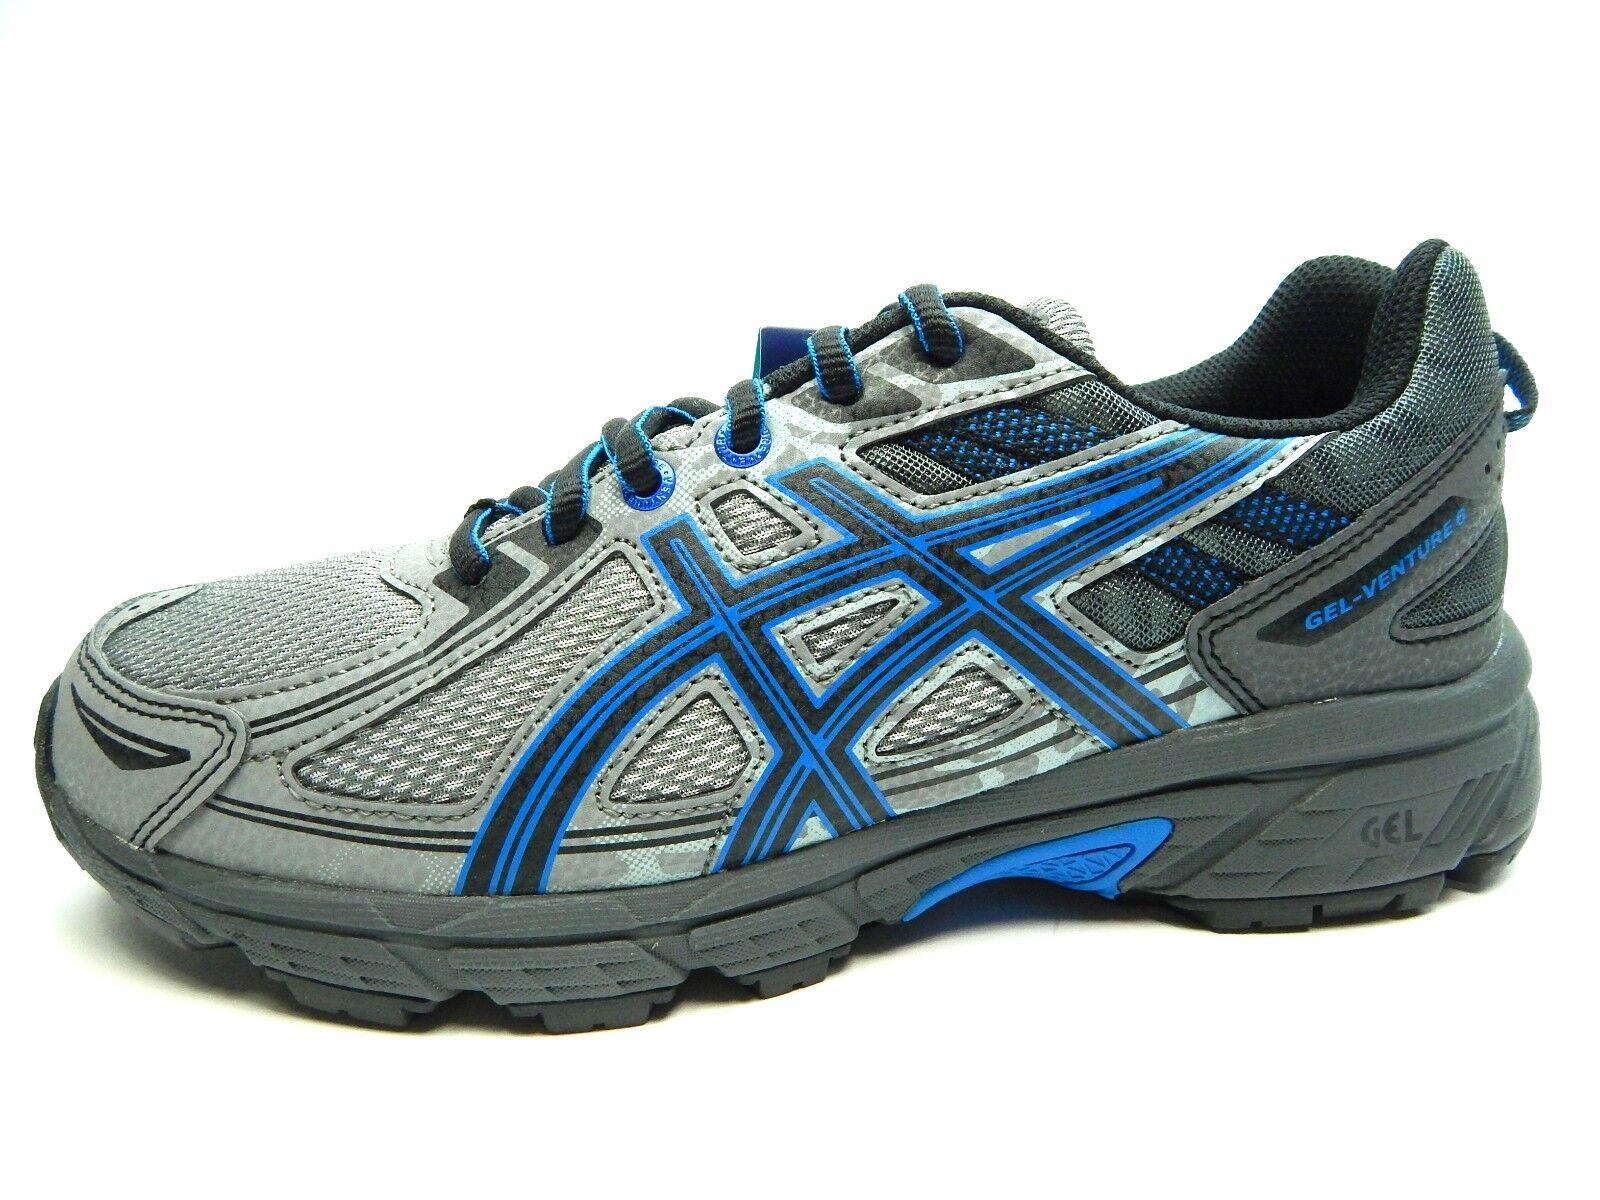 ASICS GEL GEL ASICS VENTURE 6 ALUMINUM noir DIRECTOIRE bleu 9690 hommes Chaussures SIZE 8.0 f27676